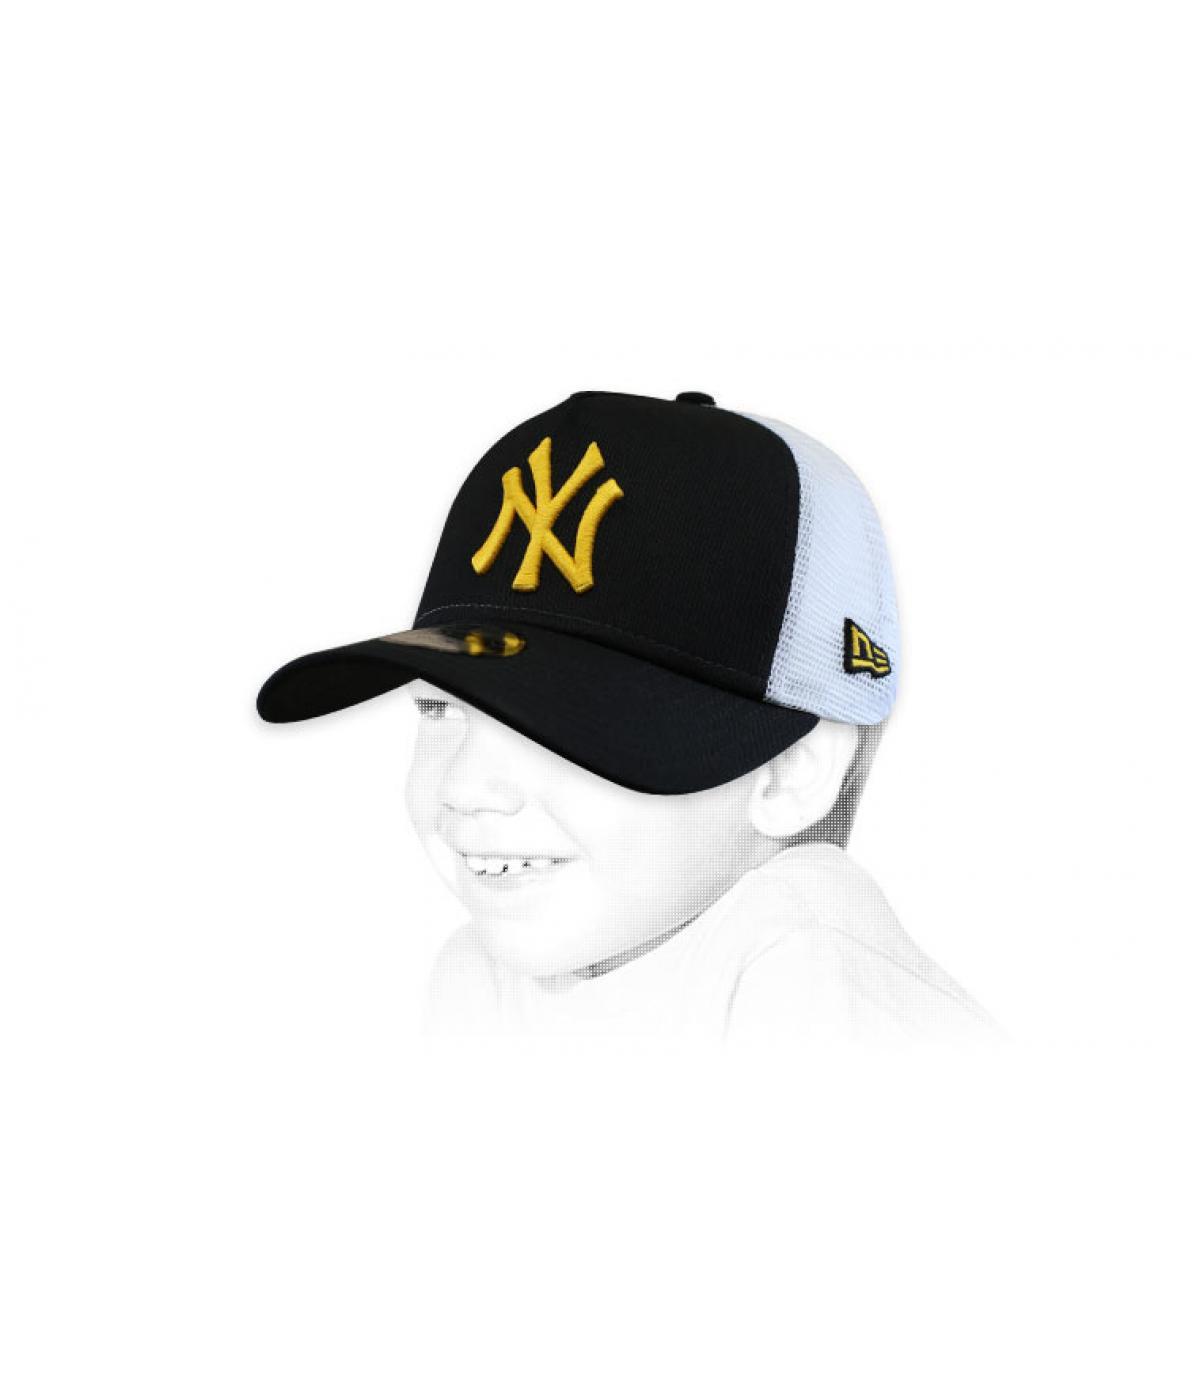 Kinder Trucker NY schwarz gelb